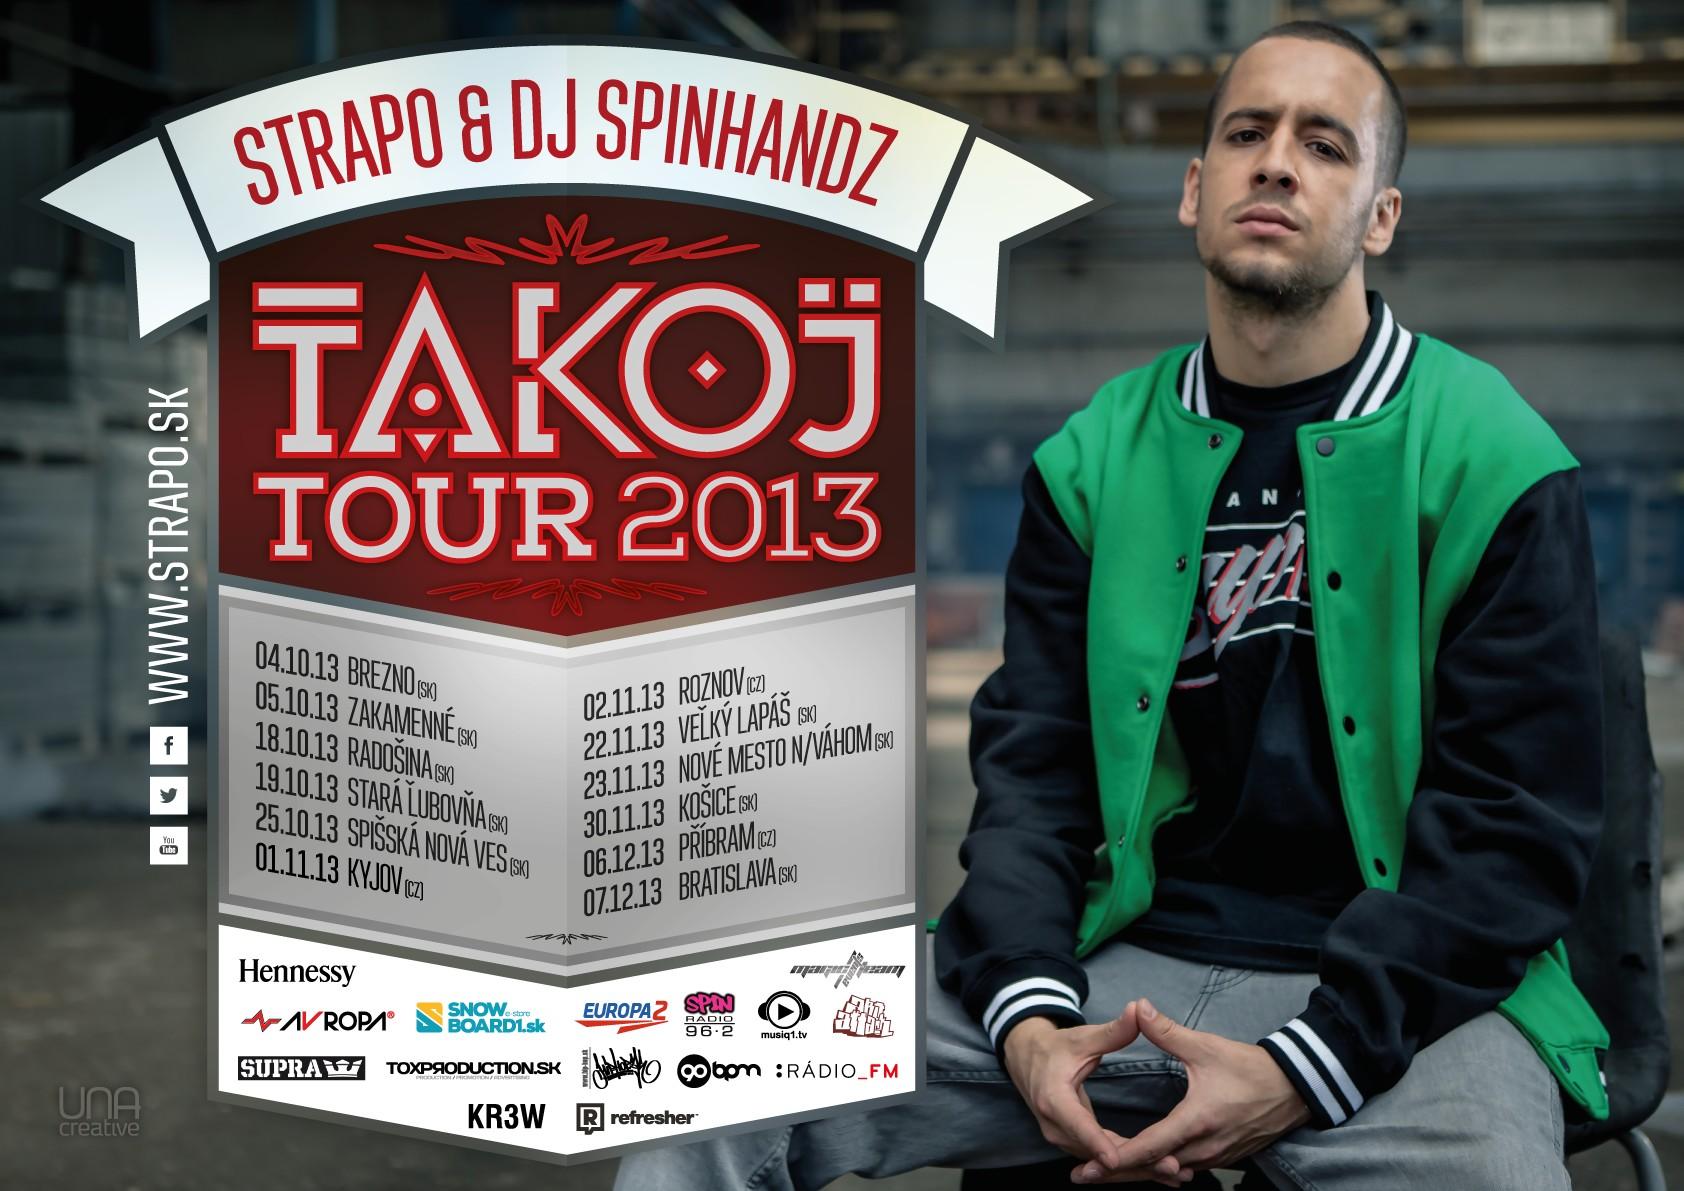 Strapo-&-Dj-Spinhandz---Takoj!-Tour-2013-poster-zastavky-final-4